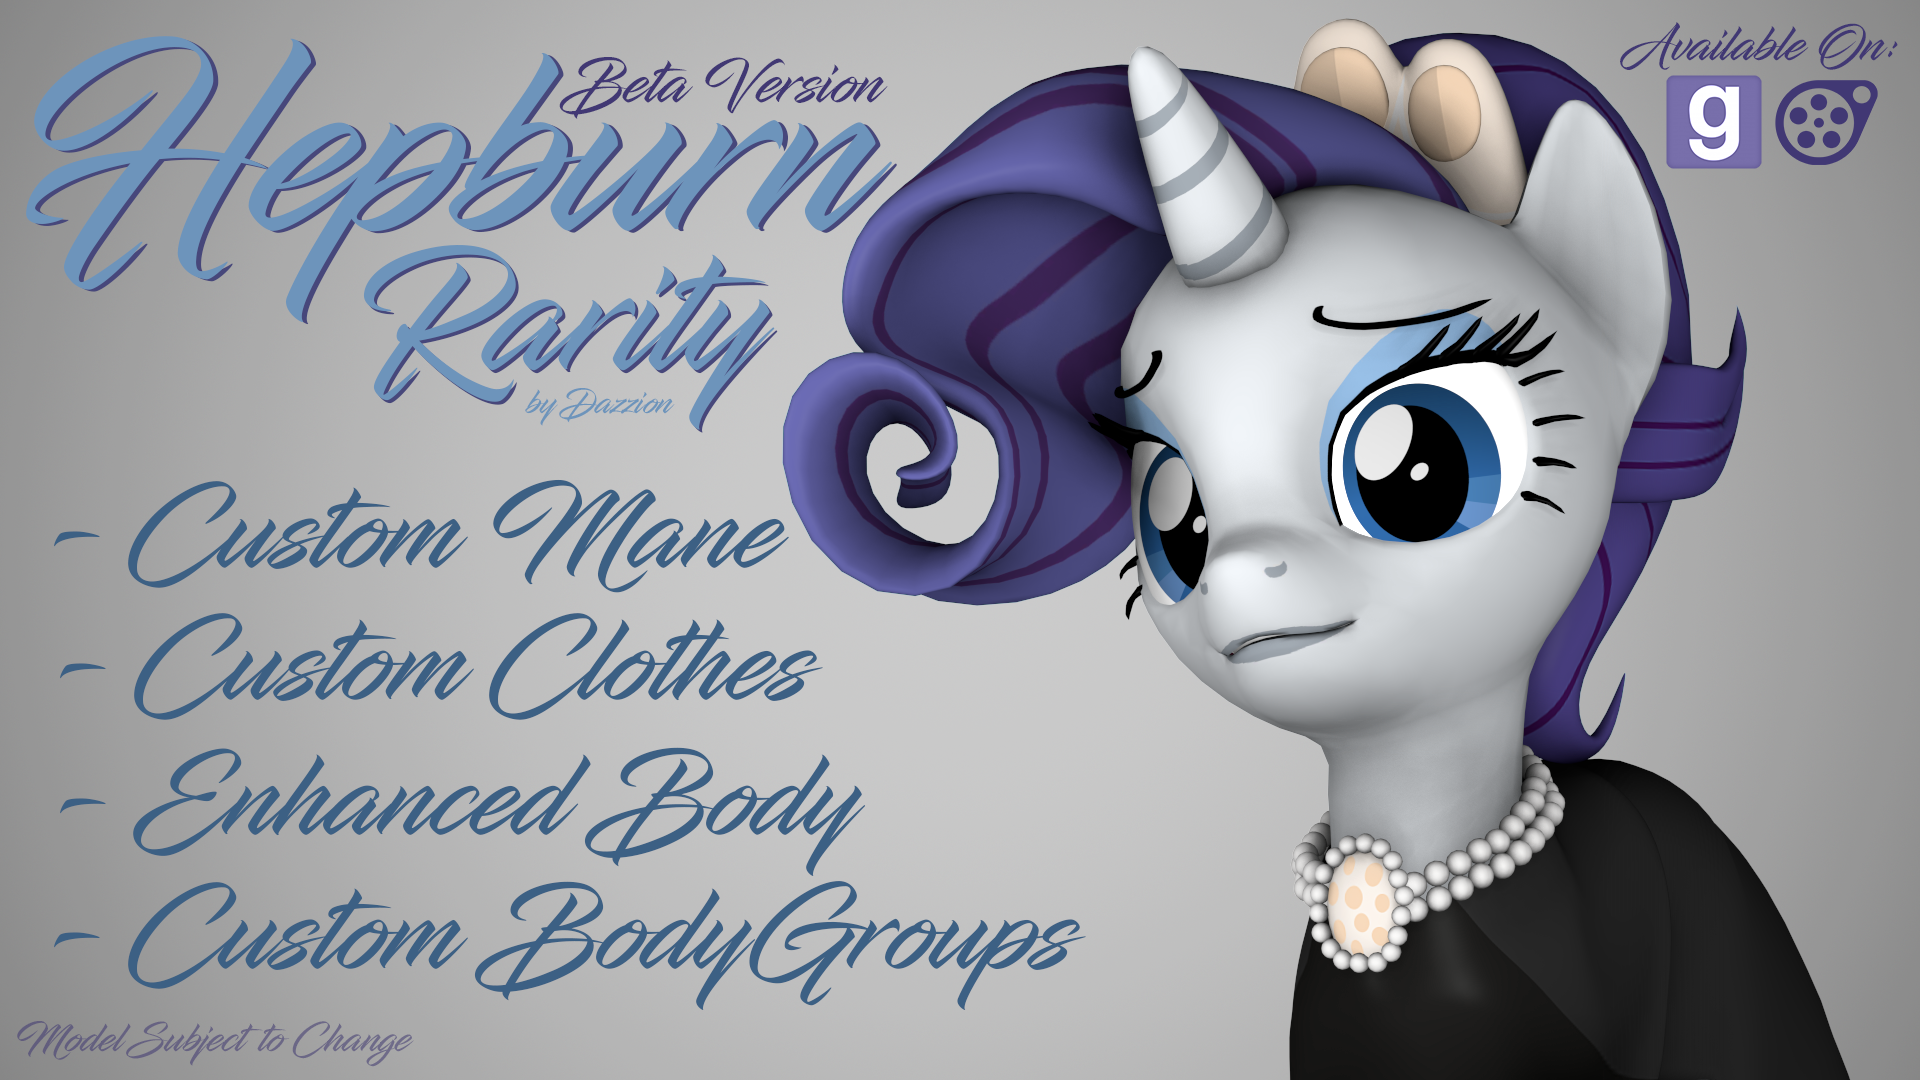 [DL] Hepburn Rarity - Version One